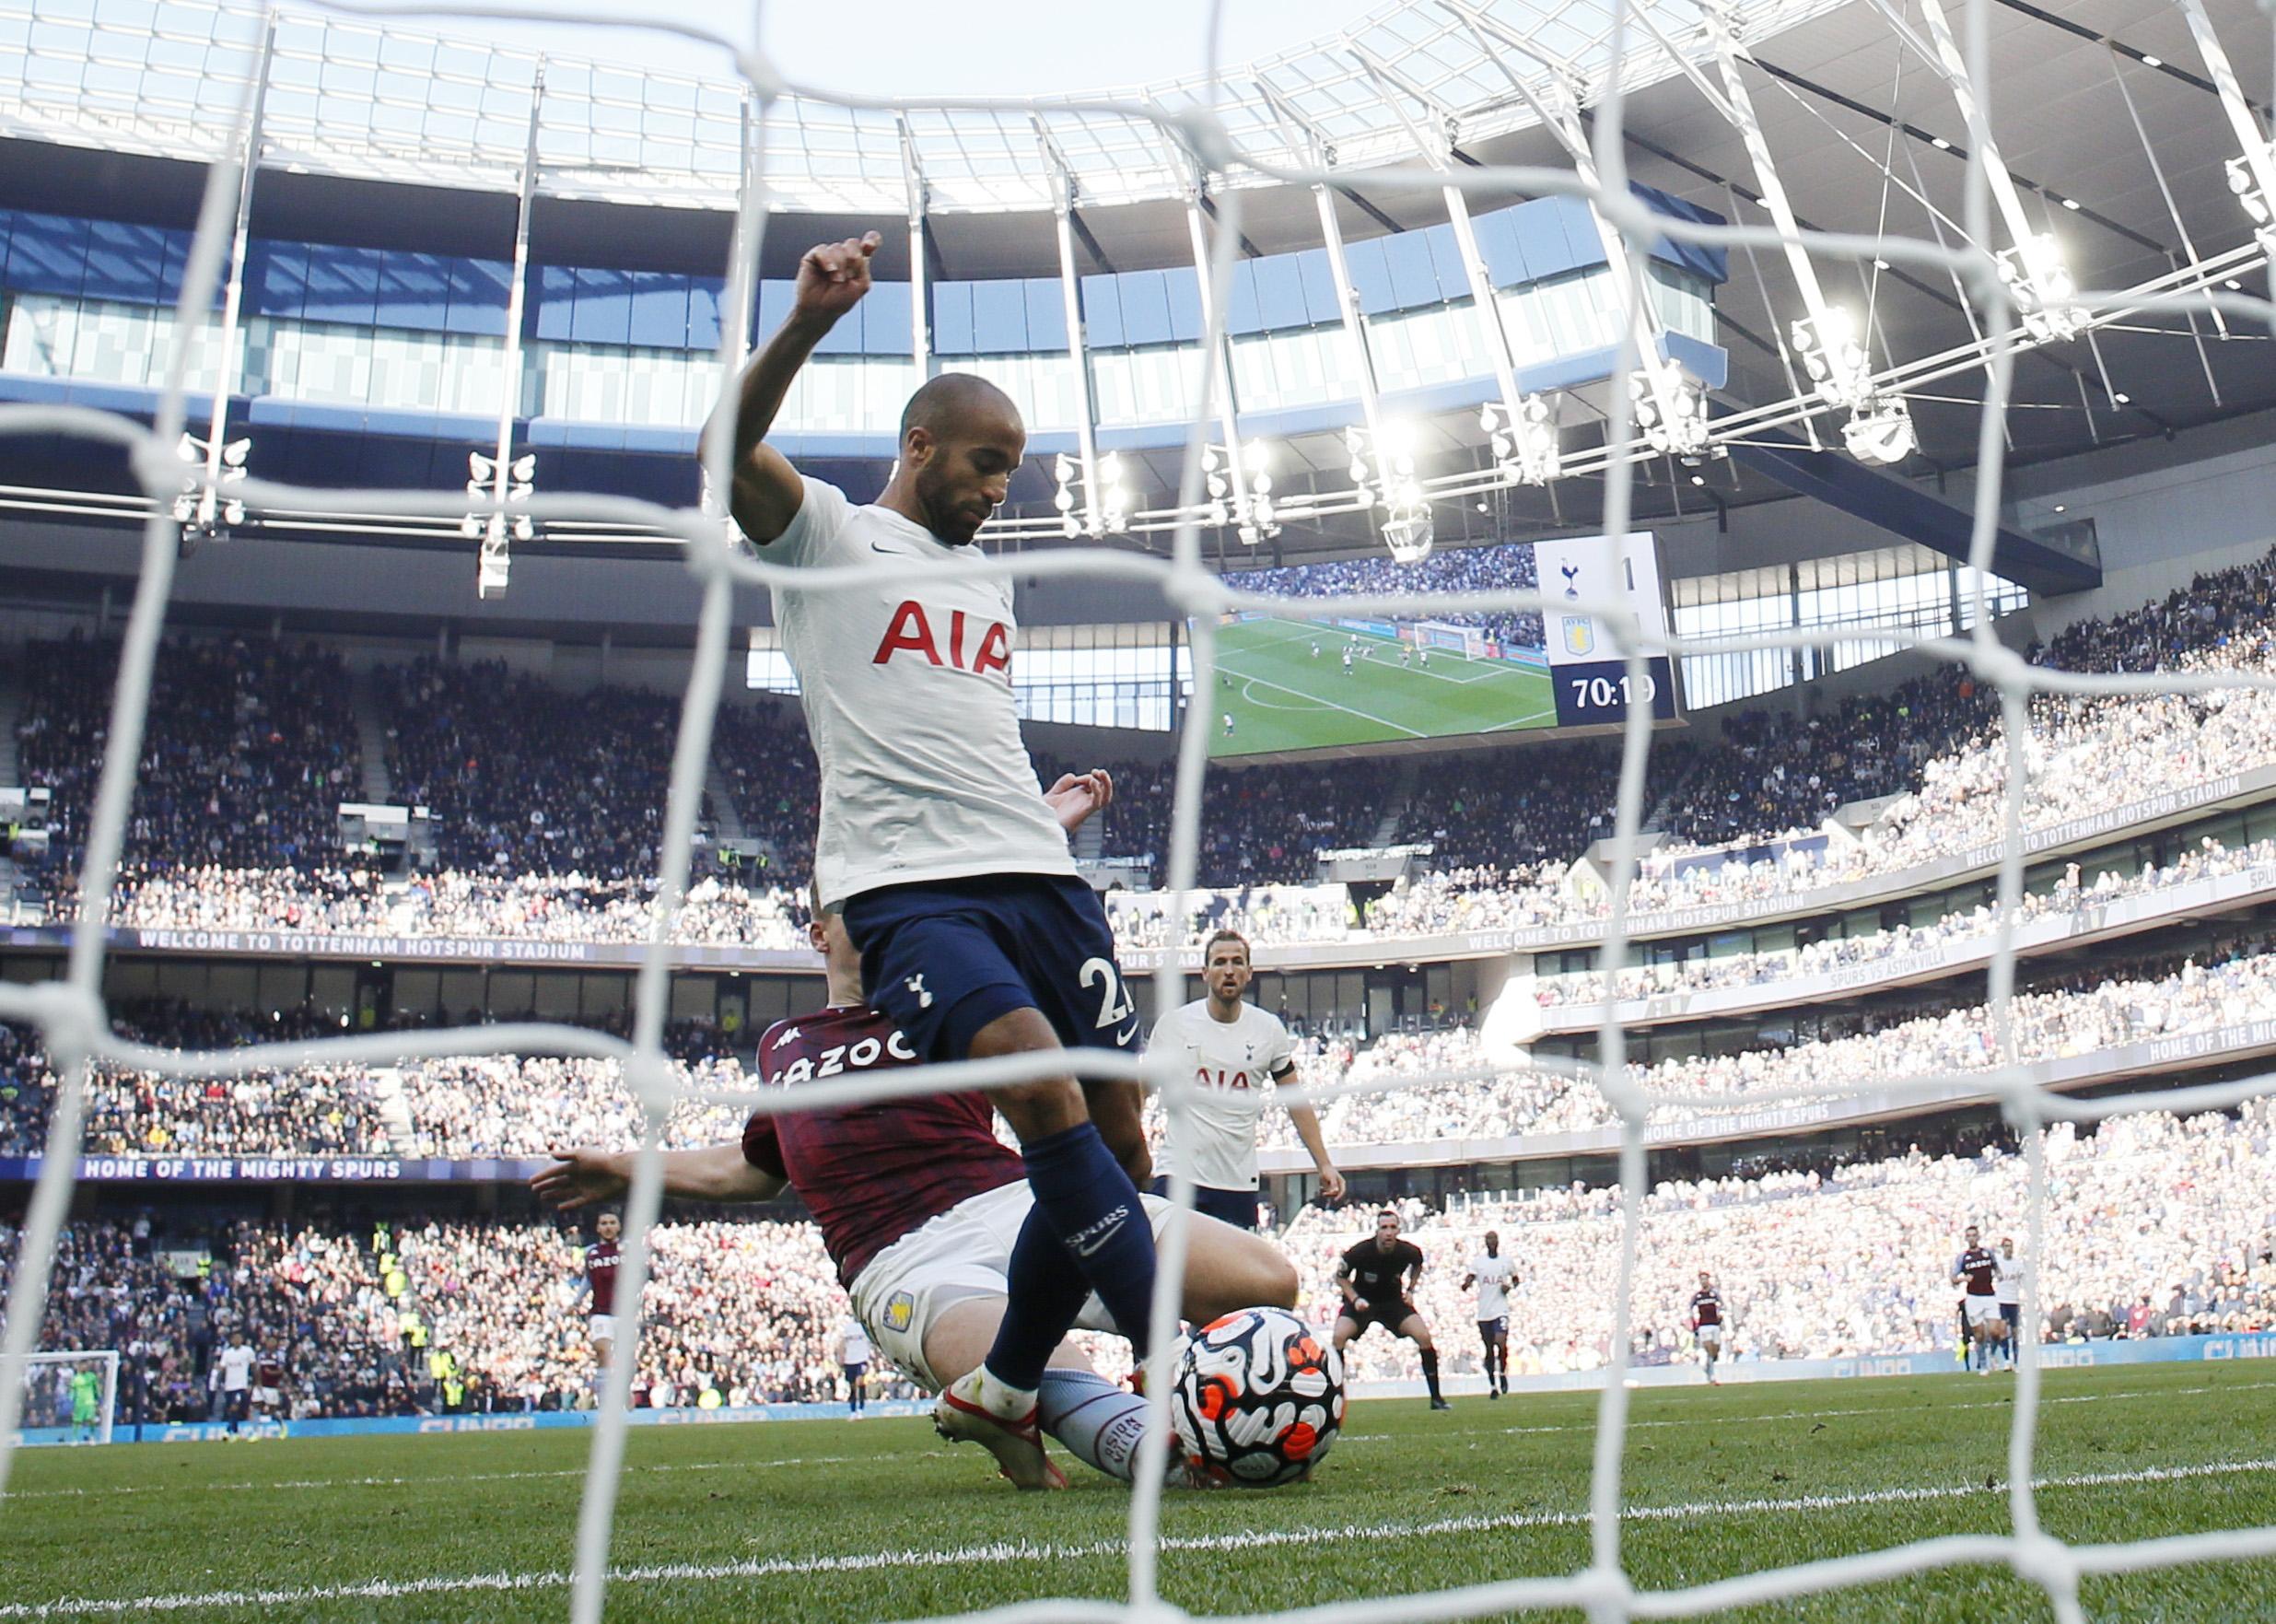 Soccer Football - Premier League - Tottenham Hotspur v Aston Villa - Tottenham Hotspur Stadium, London, Britain - October 3, 2021 Tottenham Hotspur's Lucas Moura scores their second goal REUTERS/David Klein